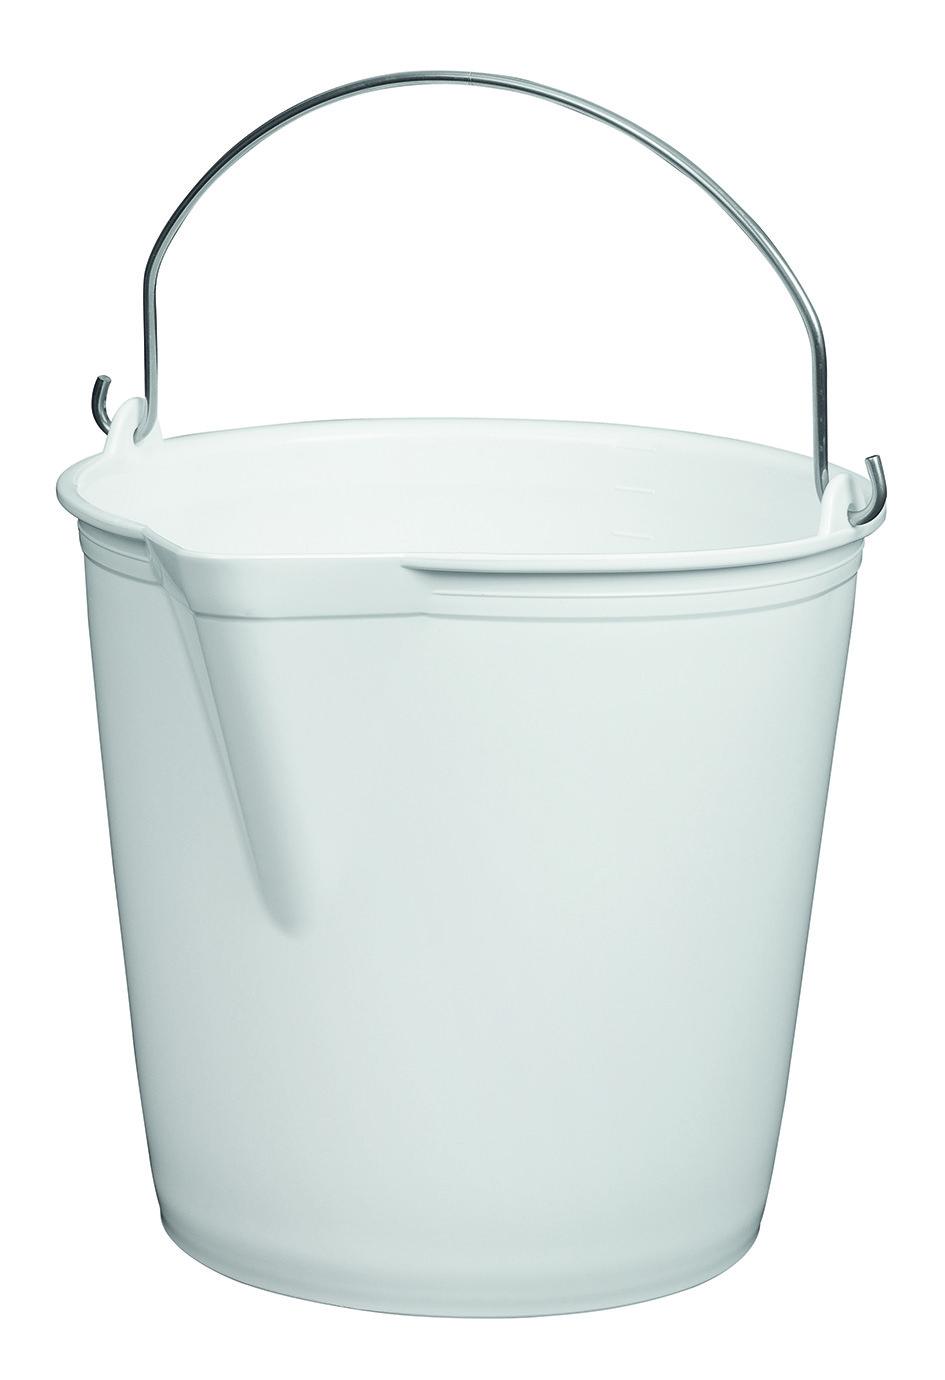 seau blanc en plastique 13 litres avec bec verseur matfer. Black Bedroom Furniture Sets. Home Design Ideas